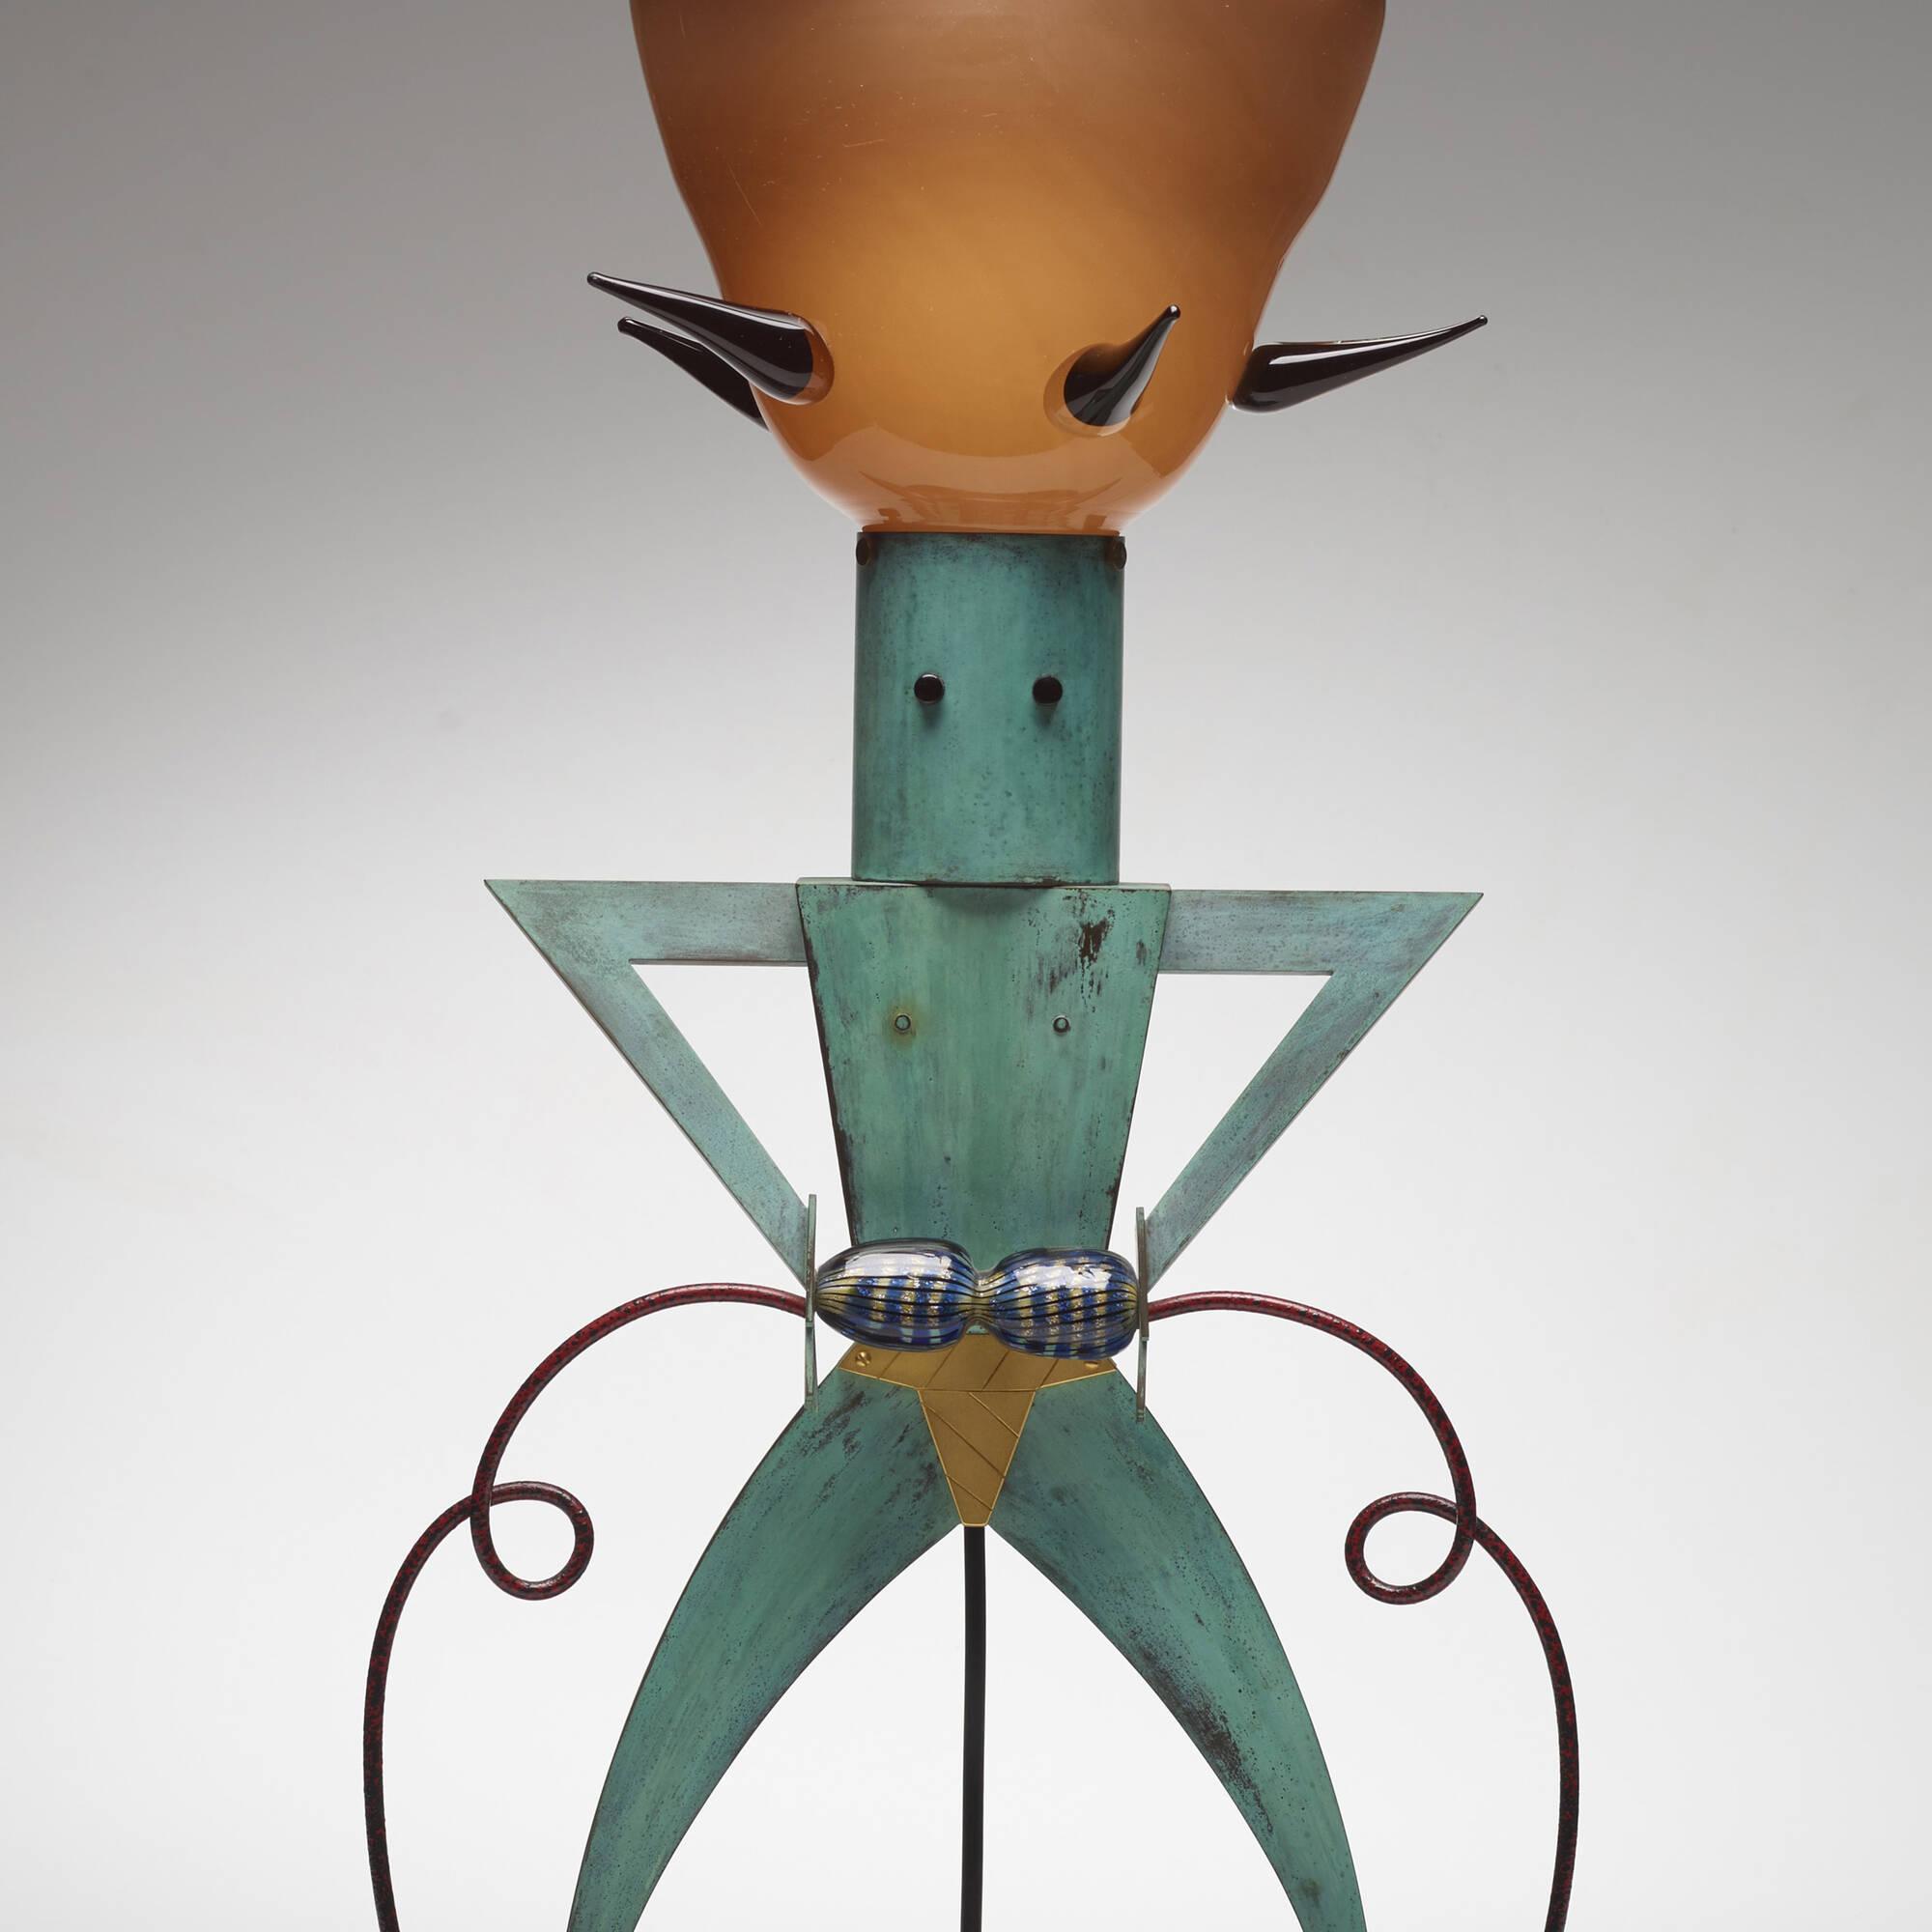 171: Dan Dailey / Magician lamp (2 of 3)